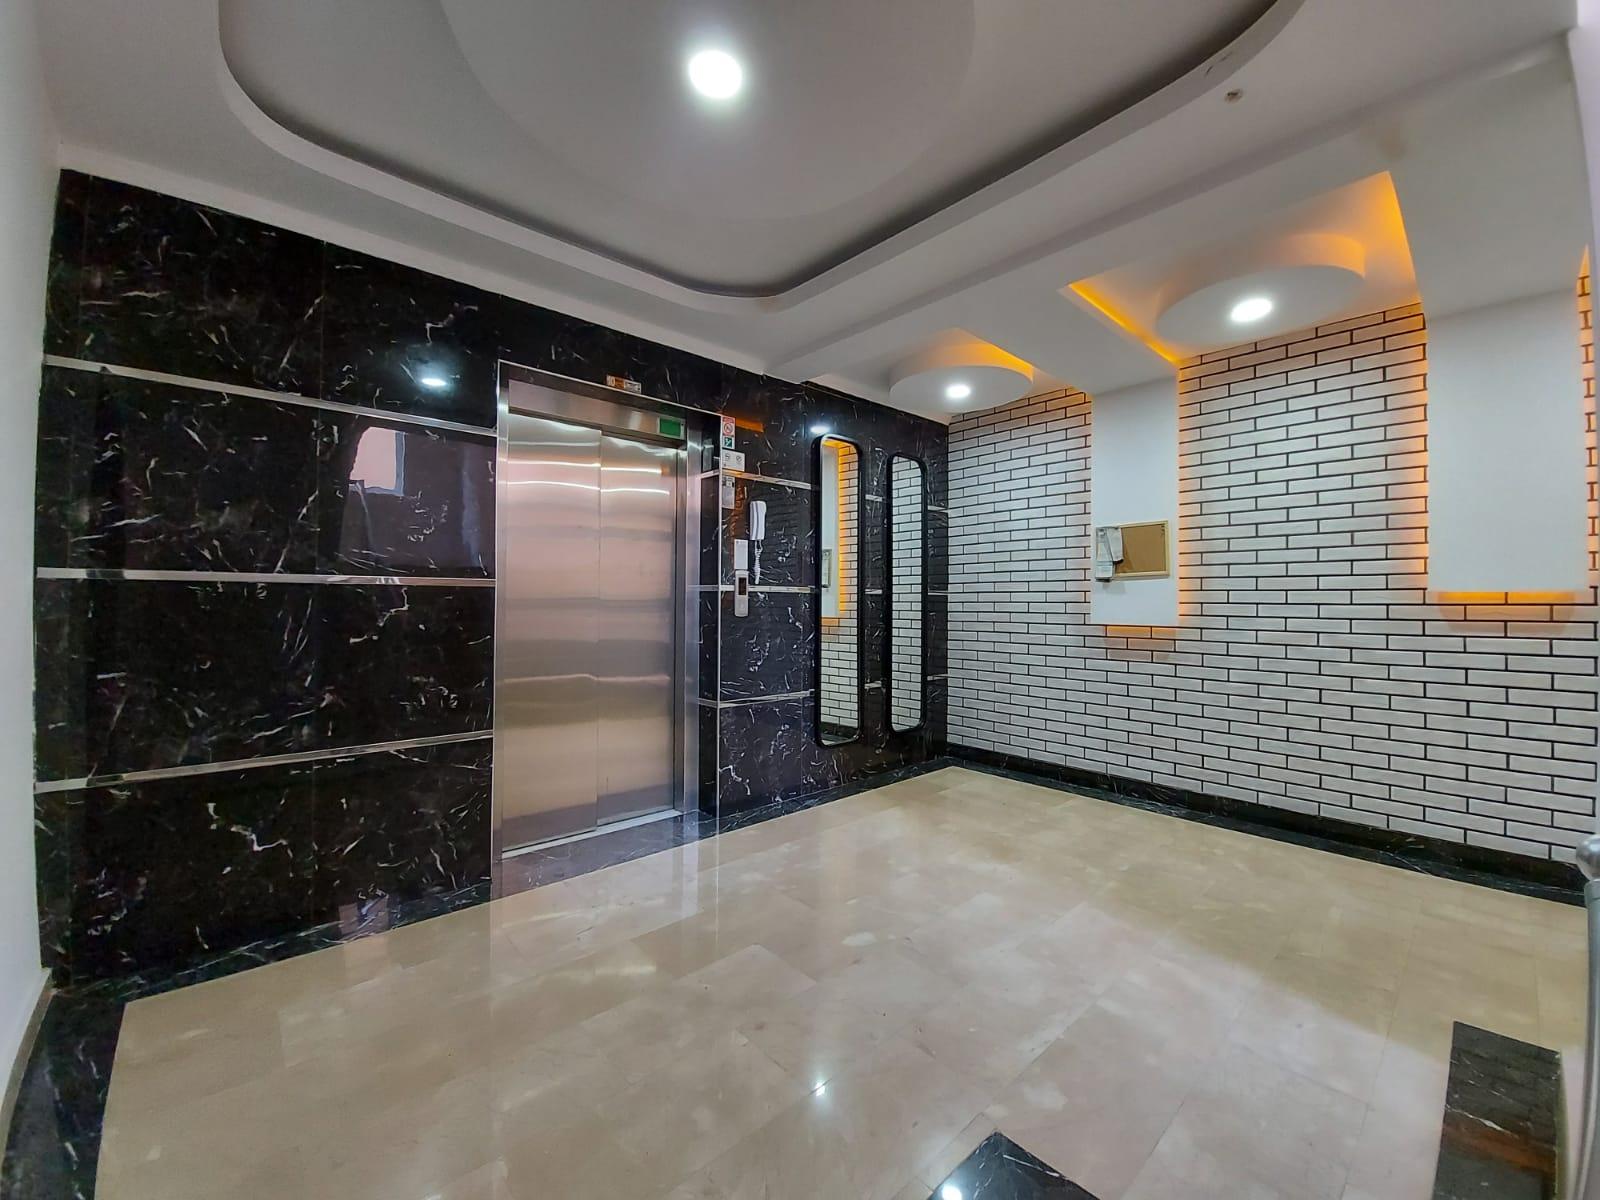 Меблированная квартира 1+1 в районе Махмутлар - Фото 2